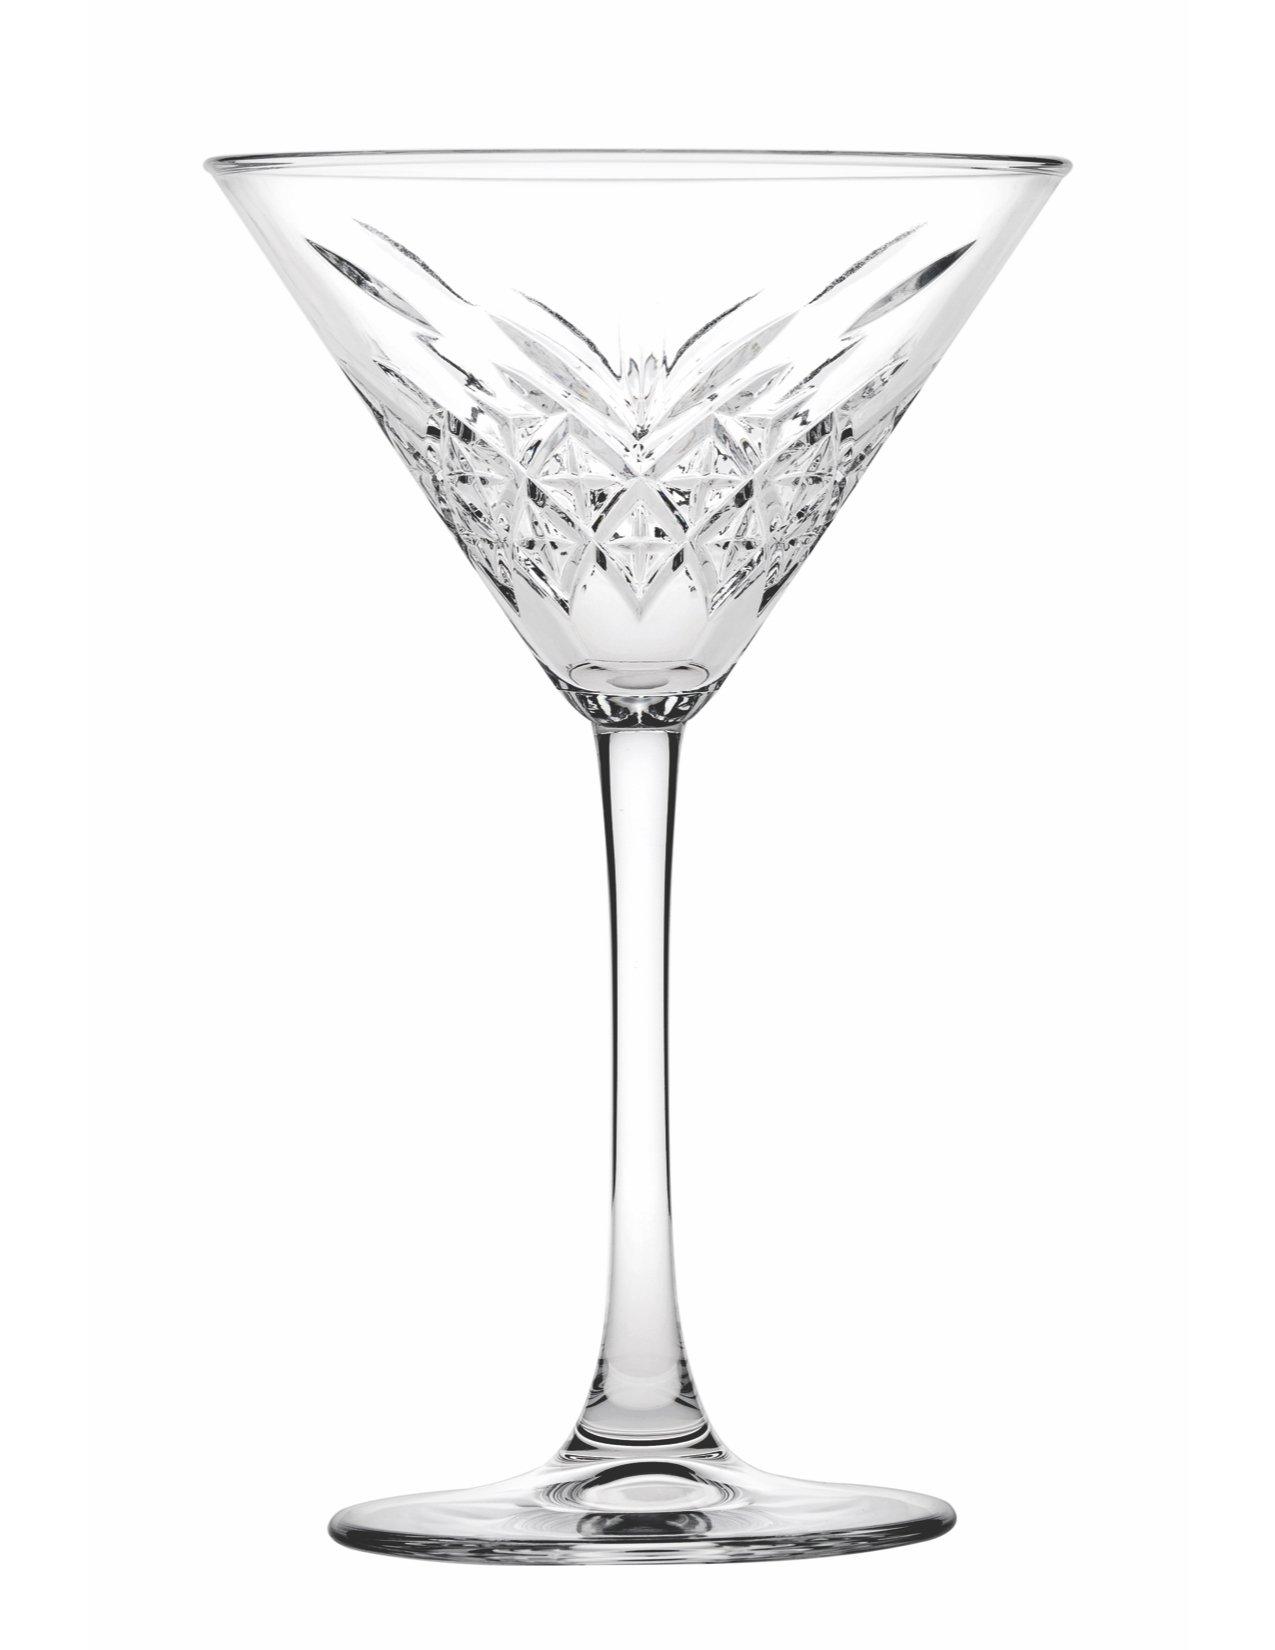 Hospitality Glass Brands 440176-012 Timeless Martini, 7.75 oz. (Pack of 12)